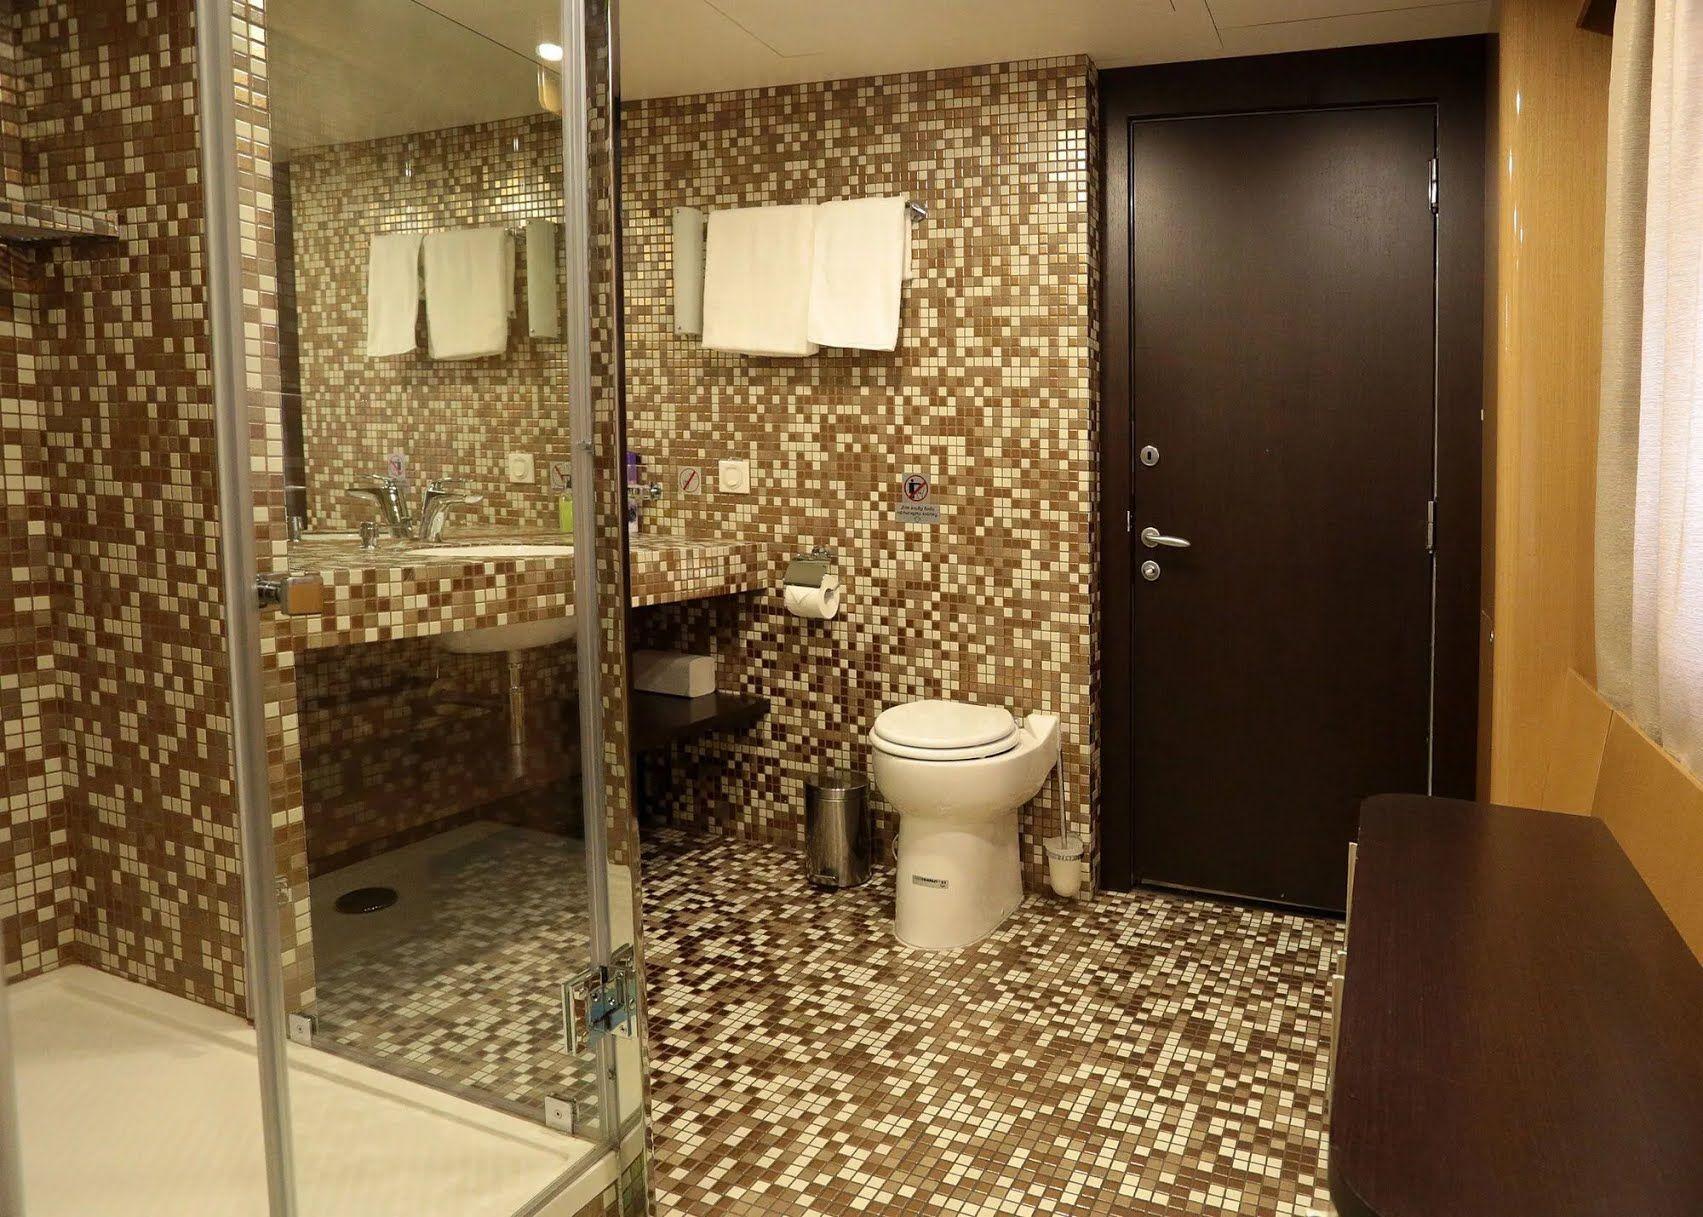 Ванная комната в новых вагонах УЗ